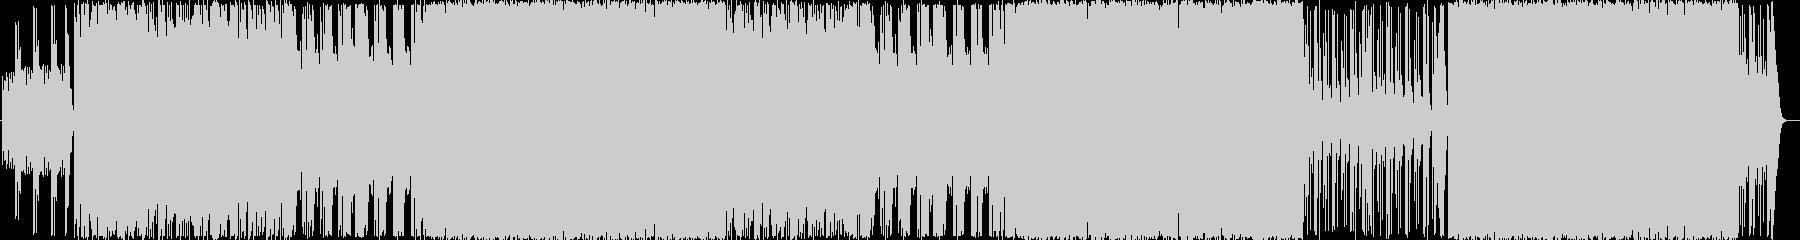 和風/和楽器(三味線・琴・太鼓)/B1の未再生の波形